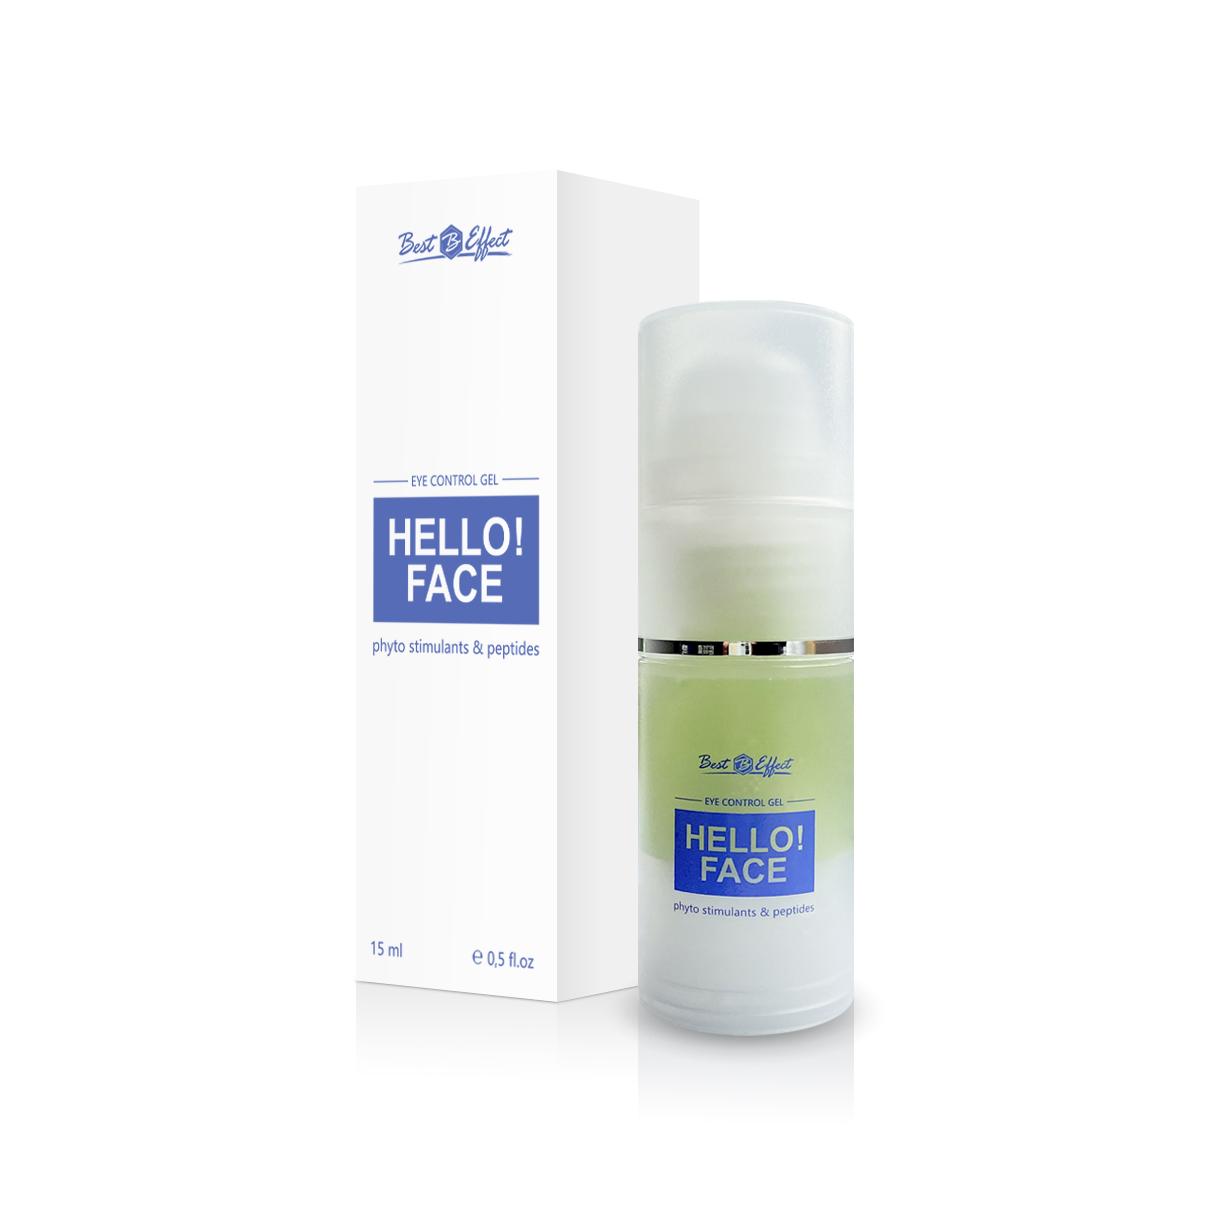 Hello!Face eye control gel